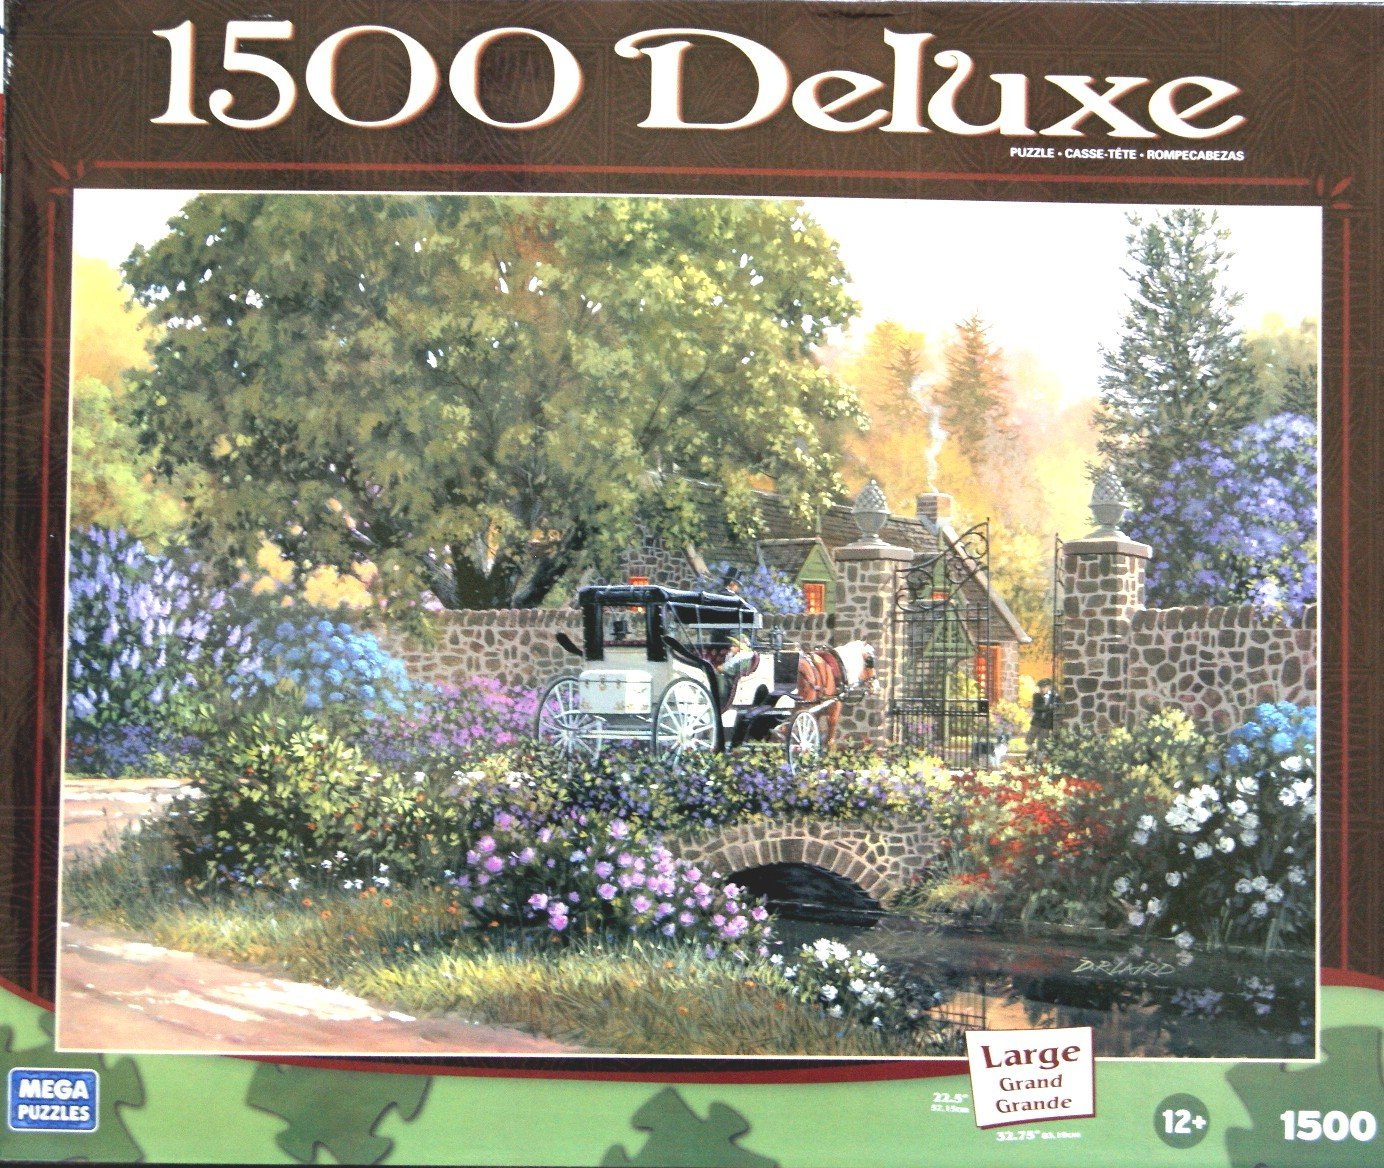 Gatekeeper's Cottage 1500 Piece Deluxe Puzzle (32.75 X 22.5 )